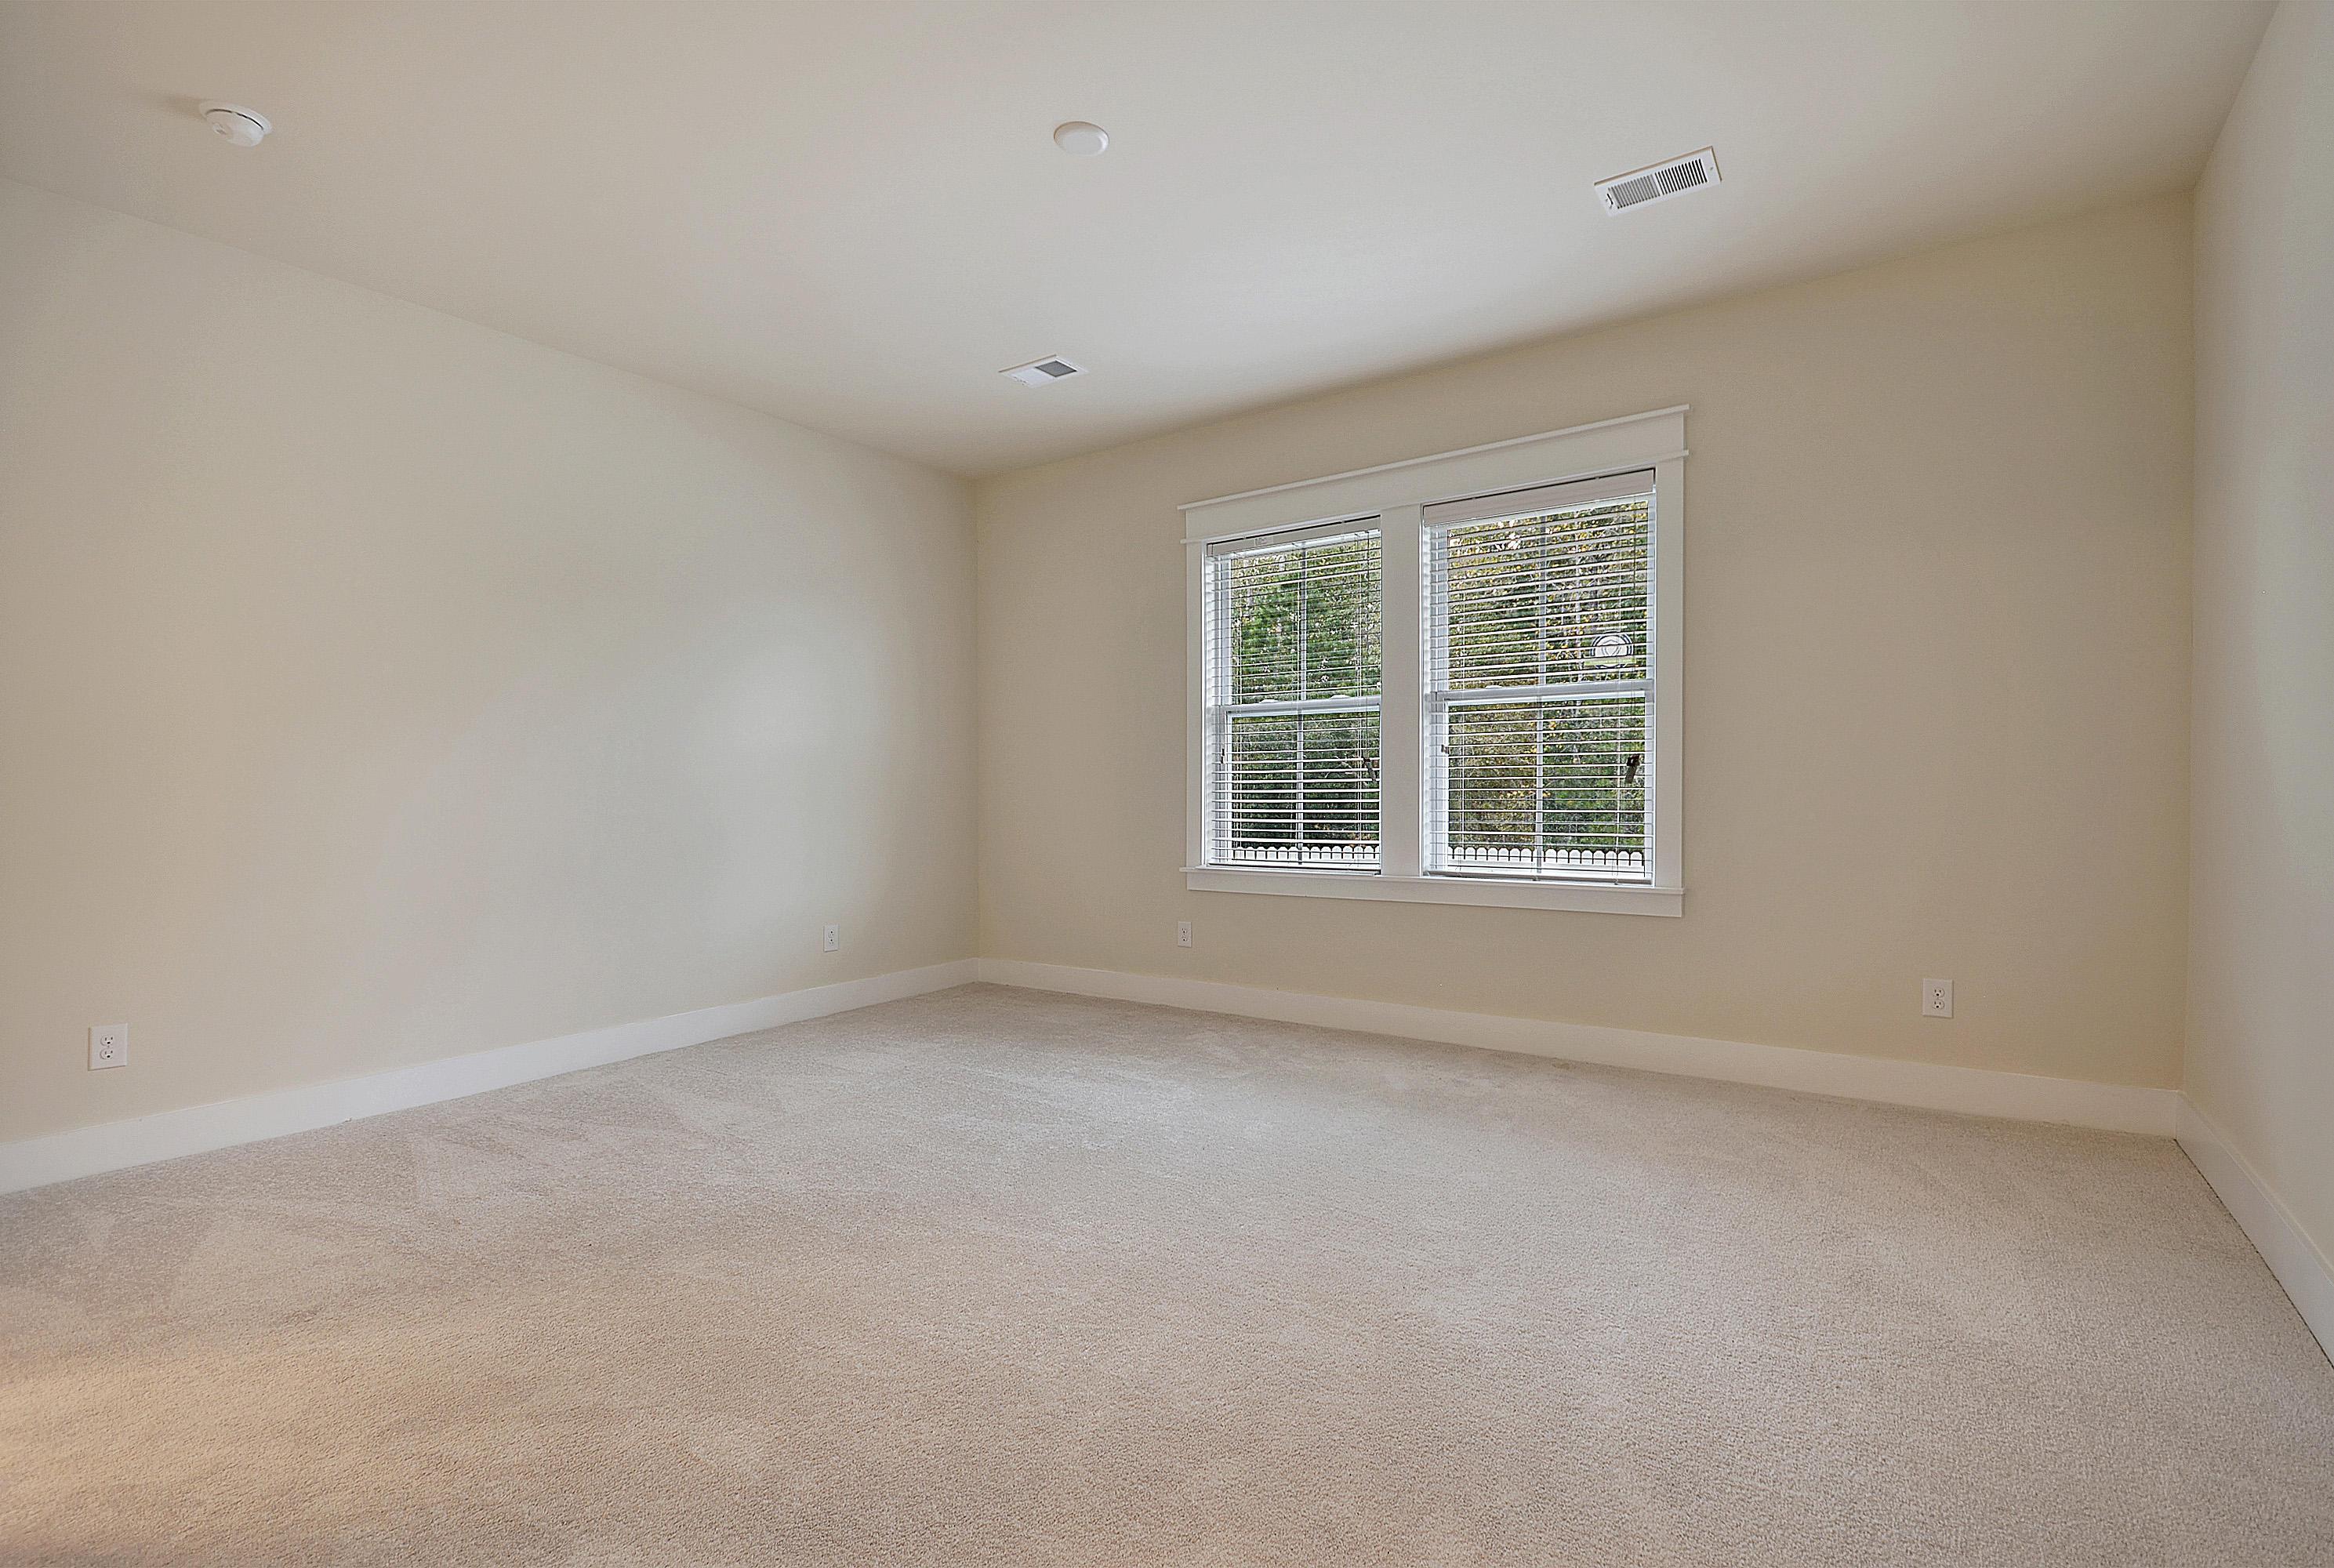 Park West Homes For Sale - 3945 Bessemer, Mount Pleasant, SC - 24